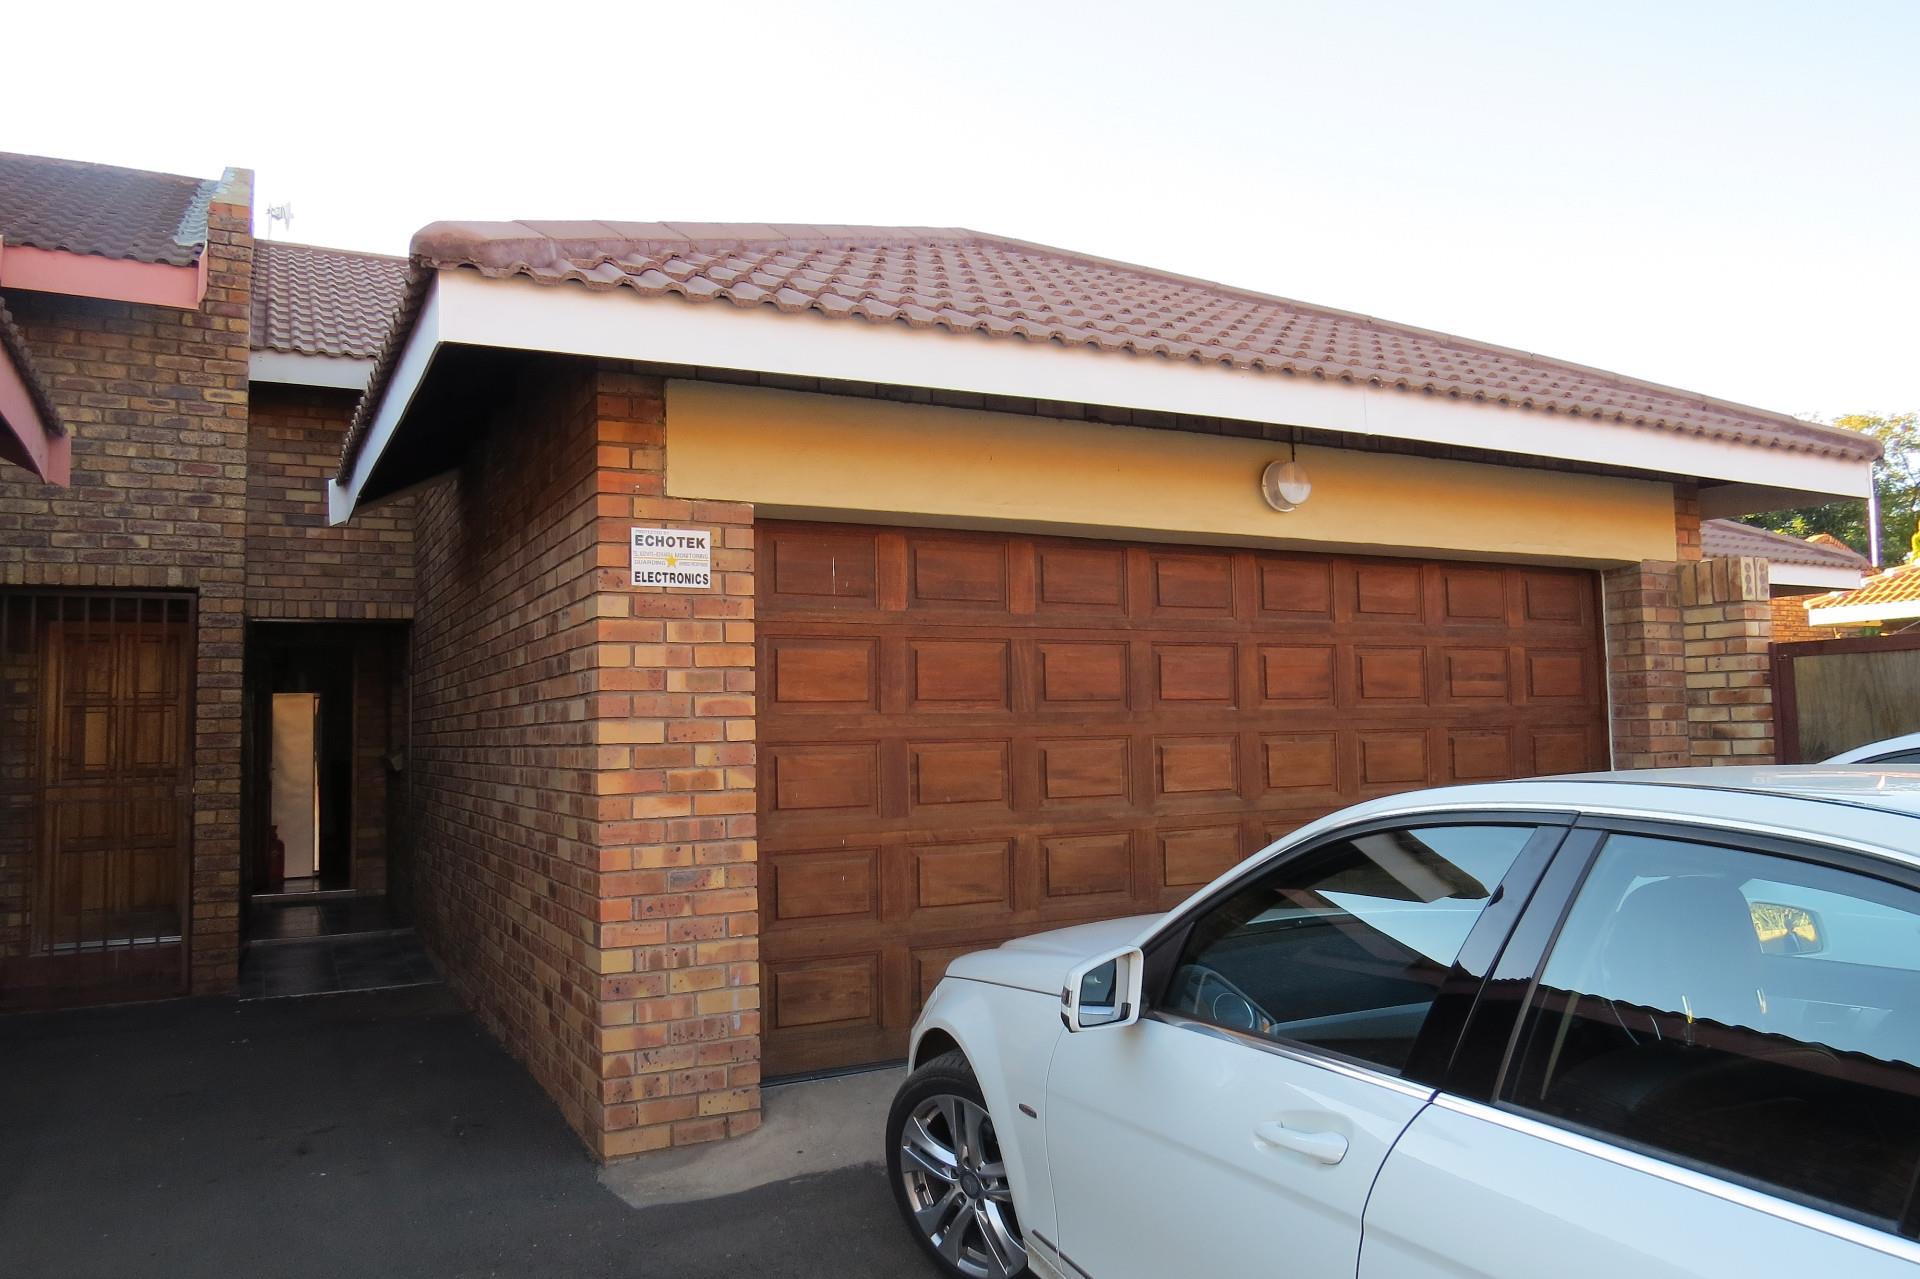 3 Bedroom Town house For Sale in Rhodesdene